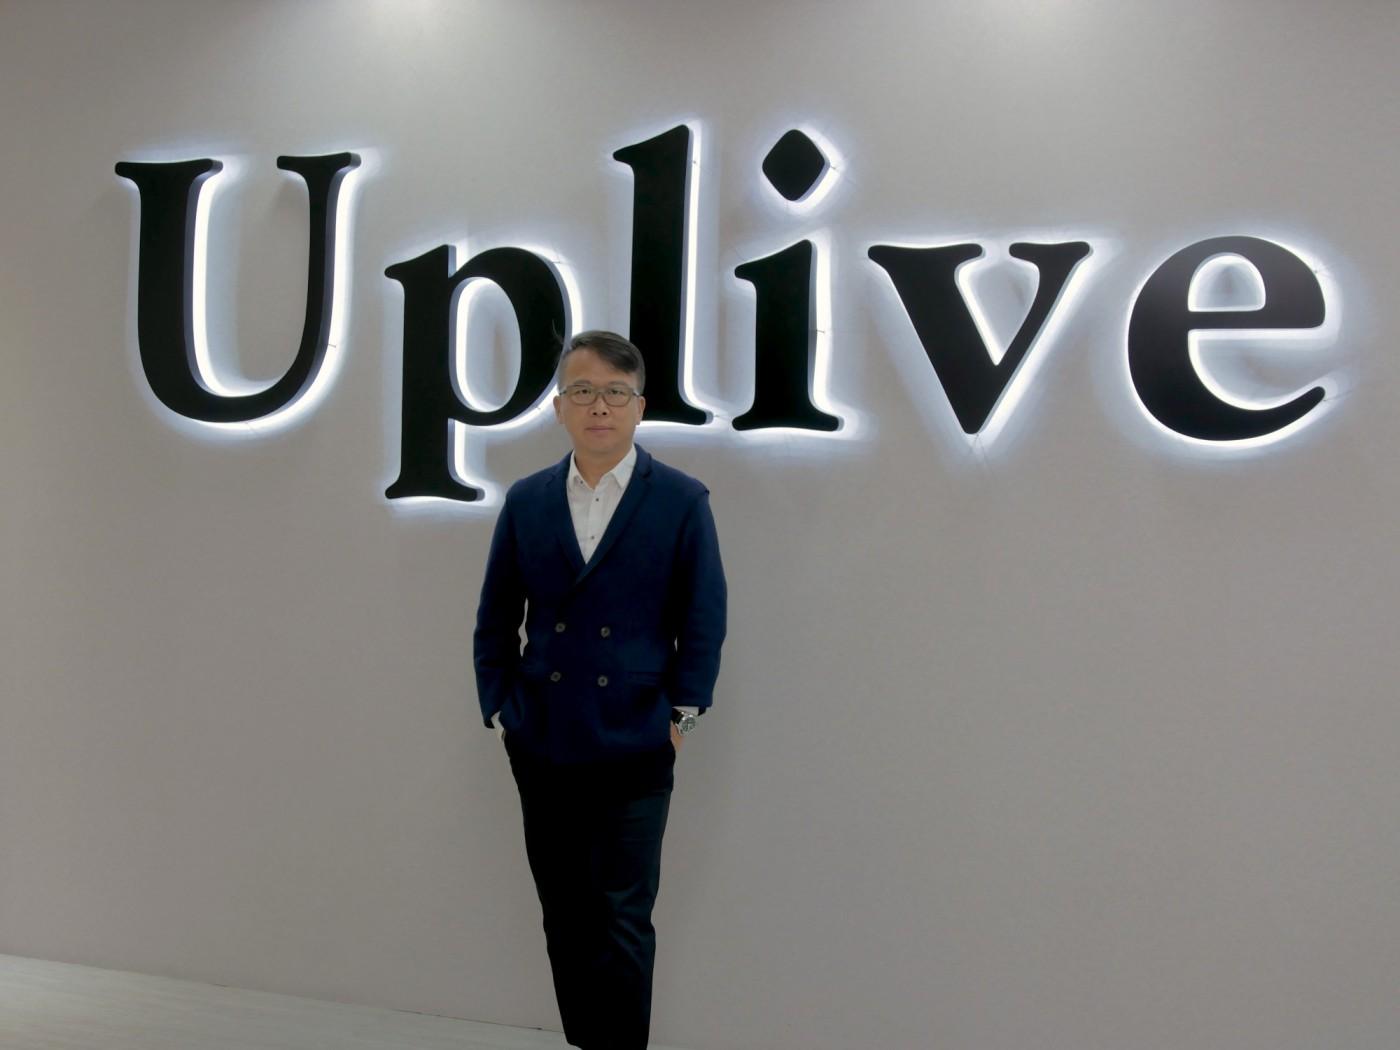 Uplive直播全球用戶達1億人後,如何從國際市場榨出更多營收成挑戰